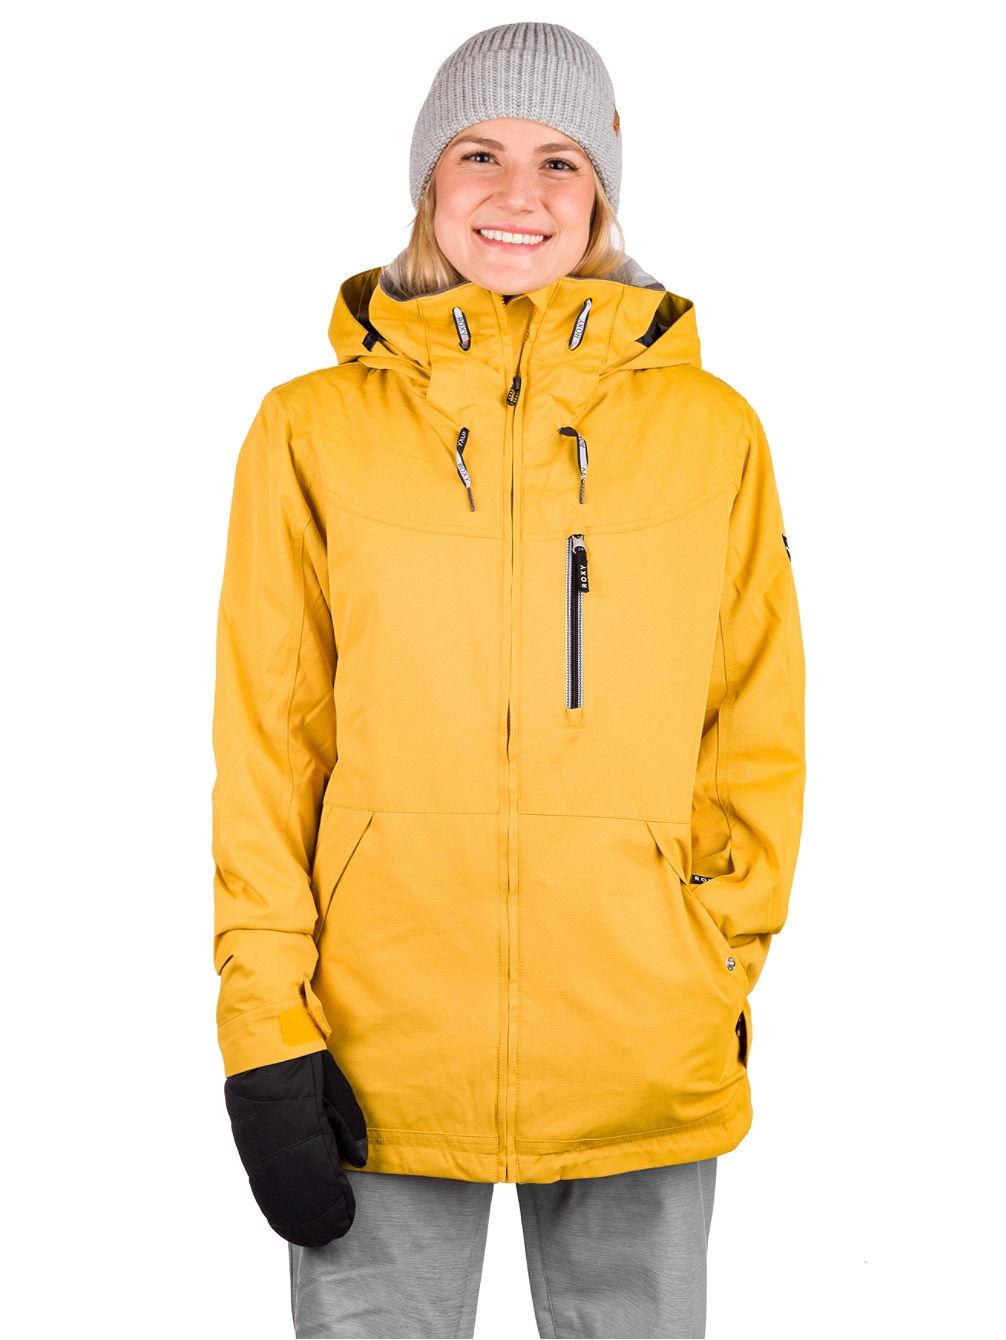 Roxy Presence Parka Insulated Snowboard Jacket Womens